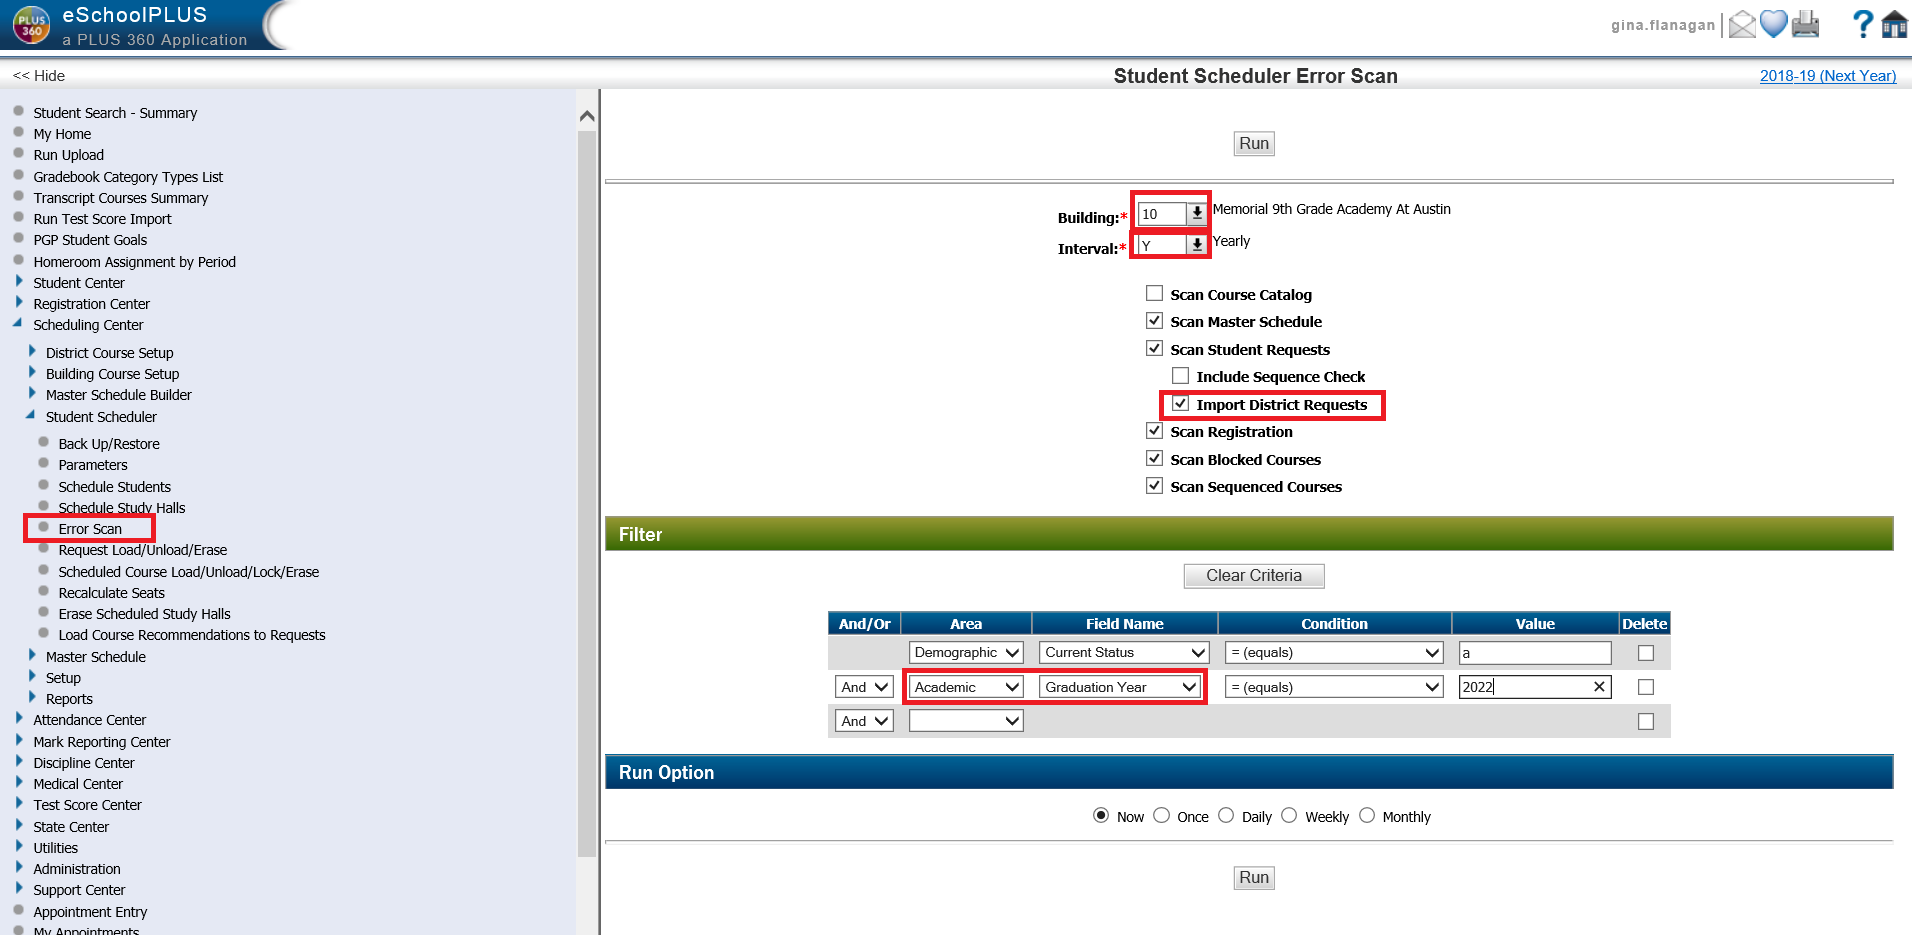 student scheduler error scan cognos student requests reports mis